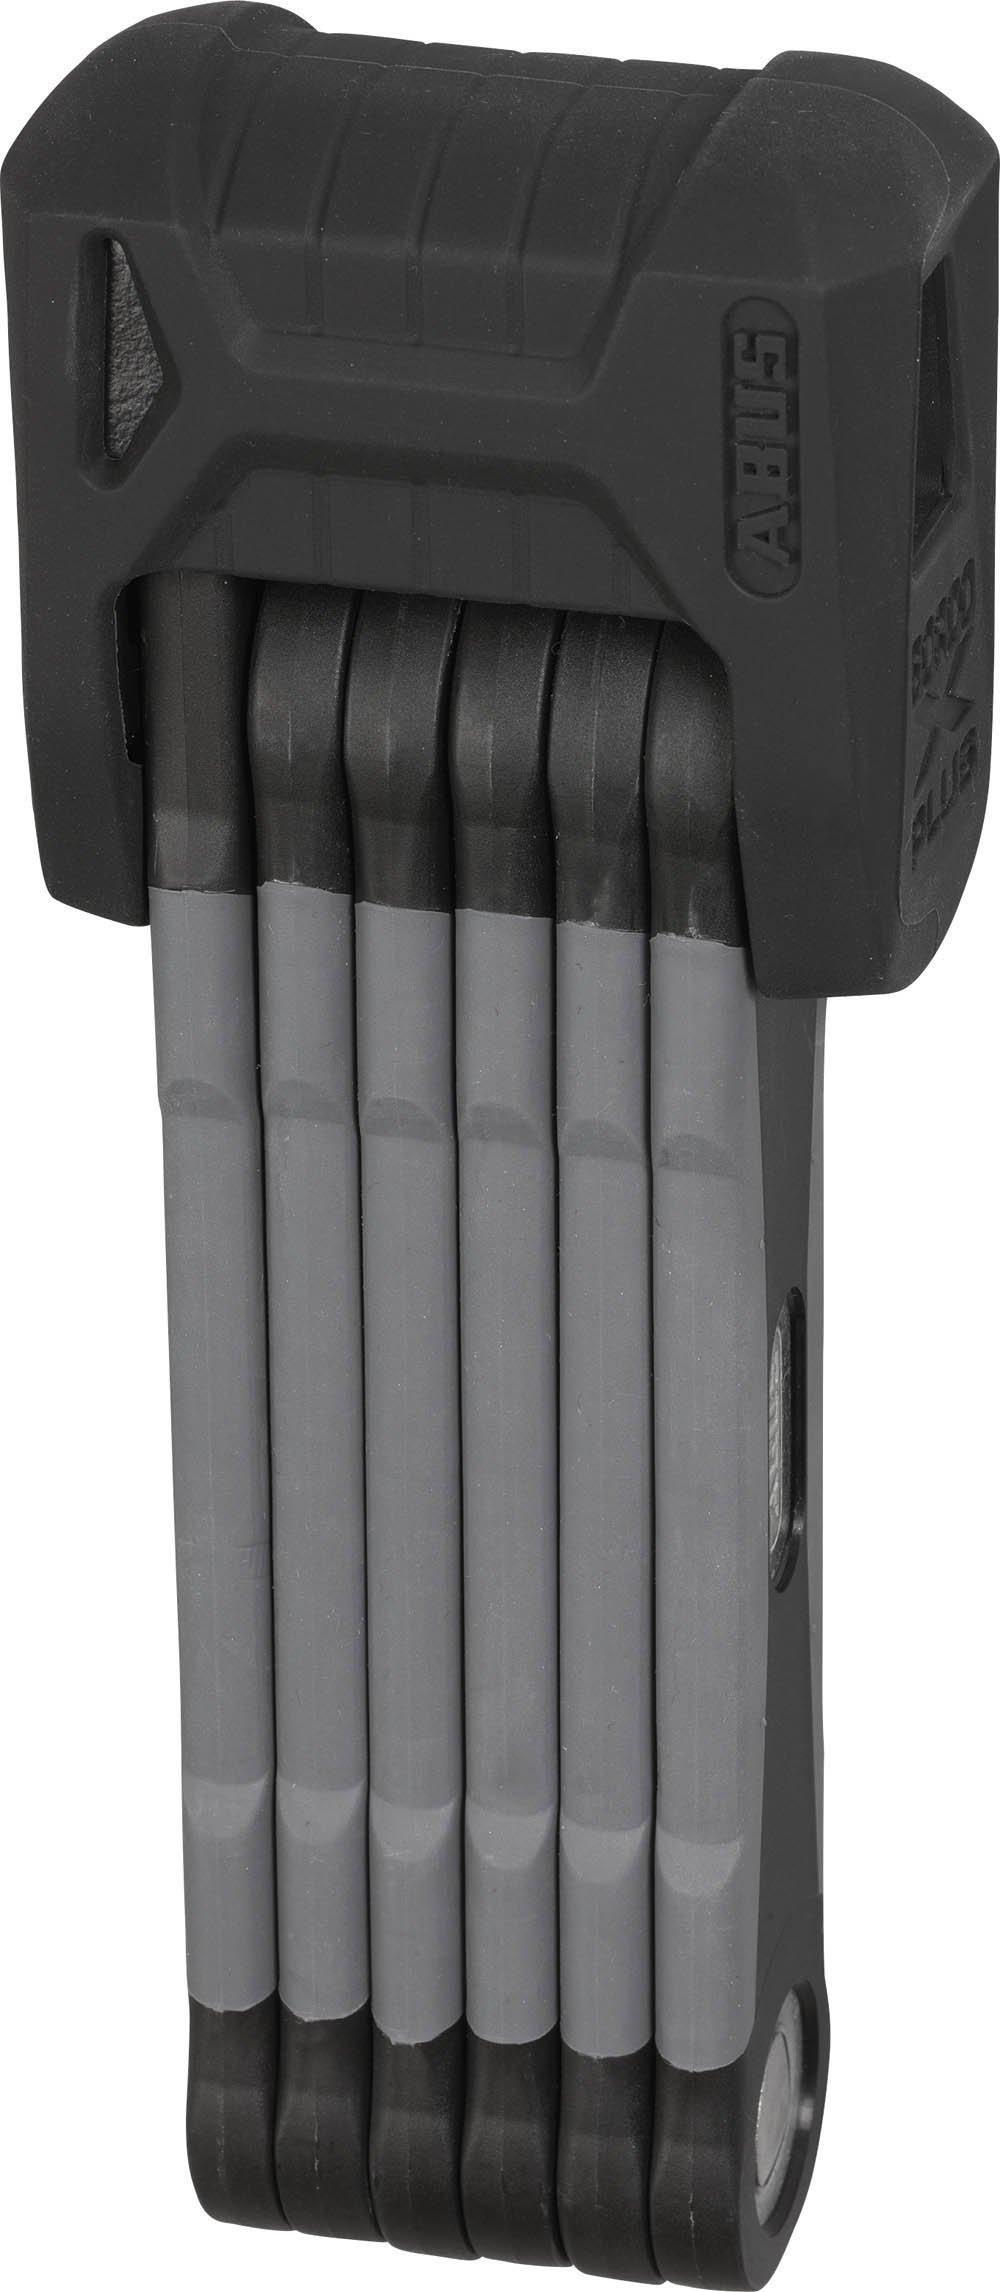 Abus Bordo GRANIT X Plus 6500/85cm (33.46 in) black - Folding lock, Bike lock, Security level 15